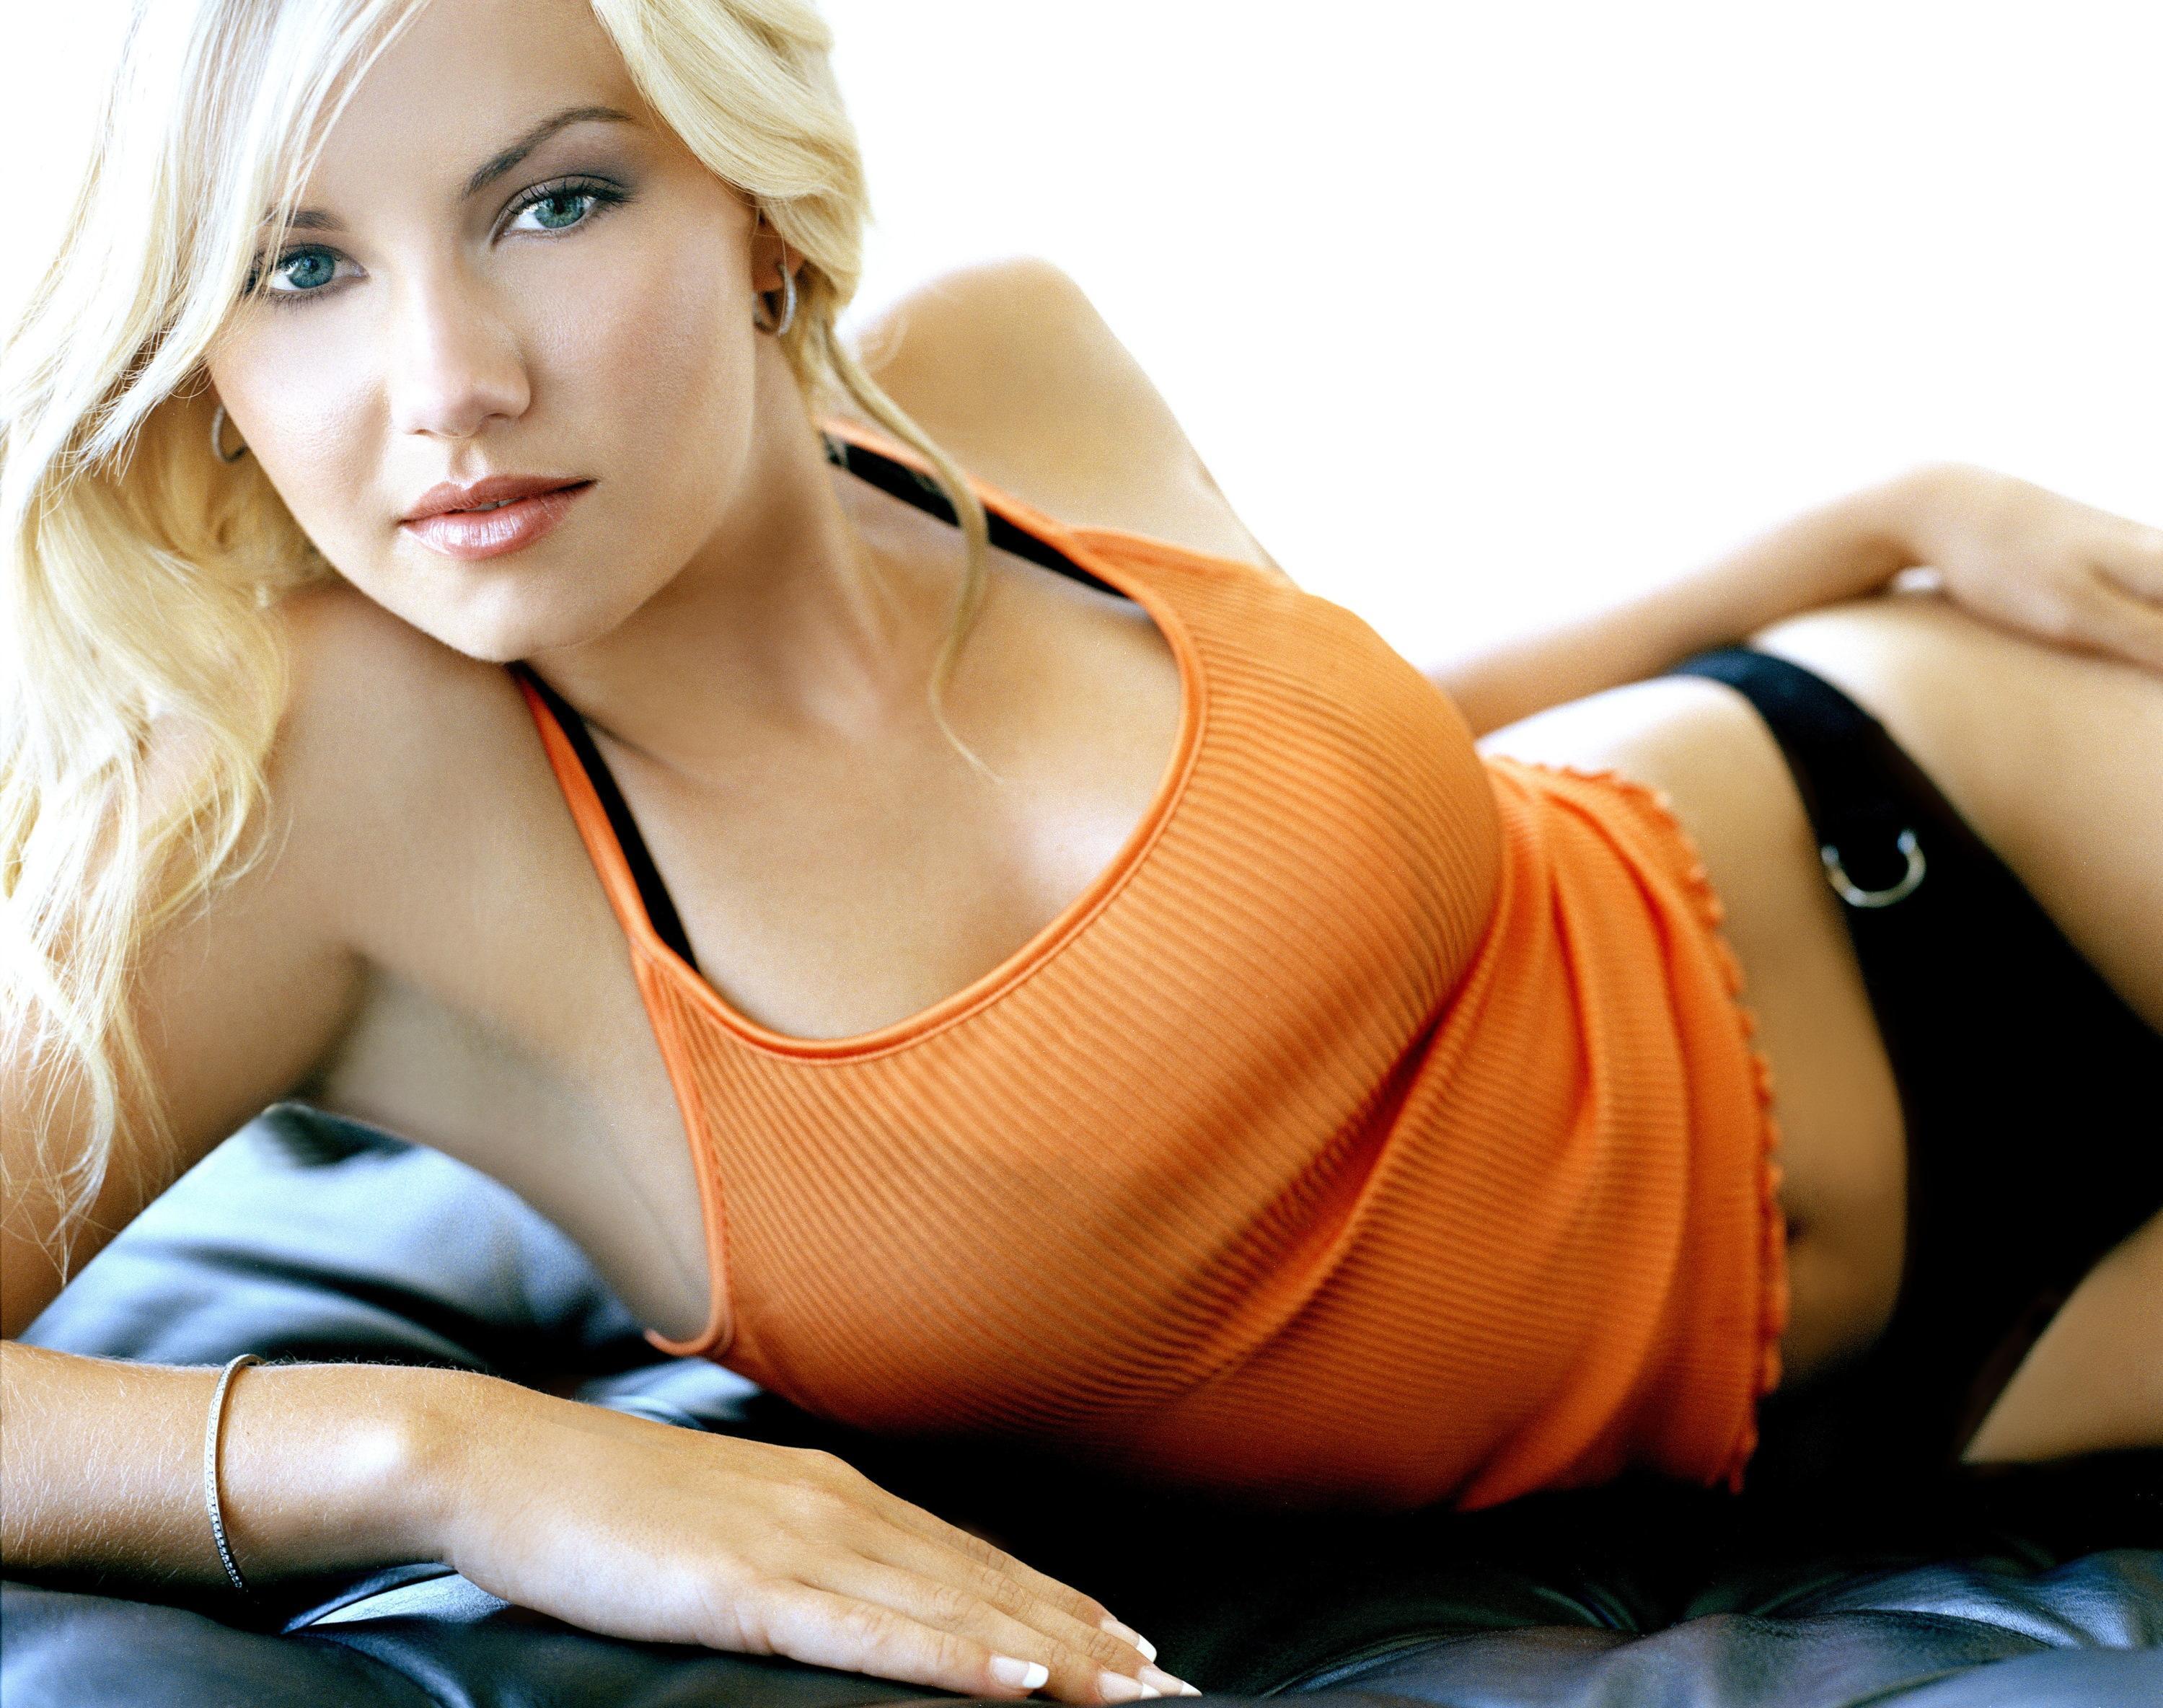 женщины блондинки видео-жж3